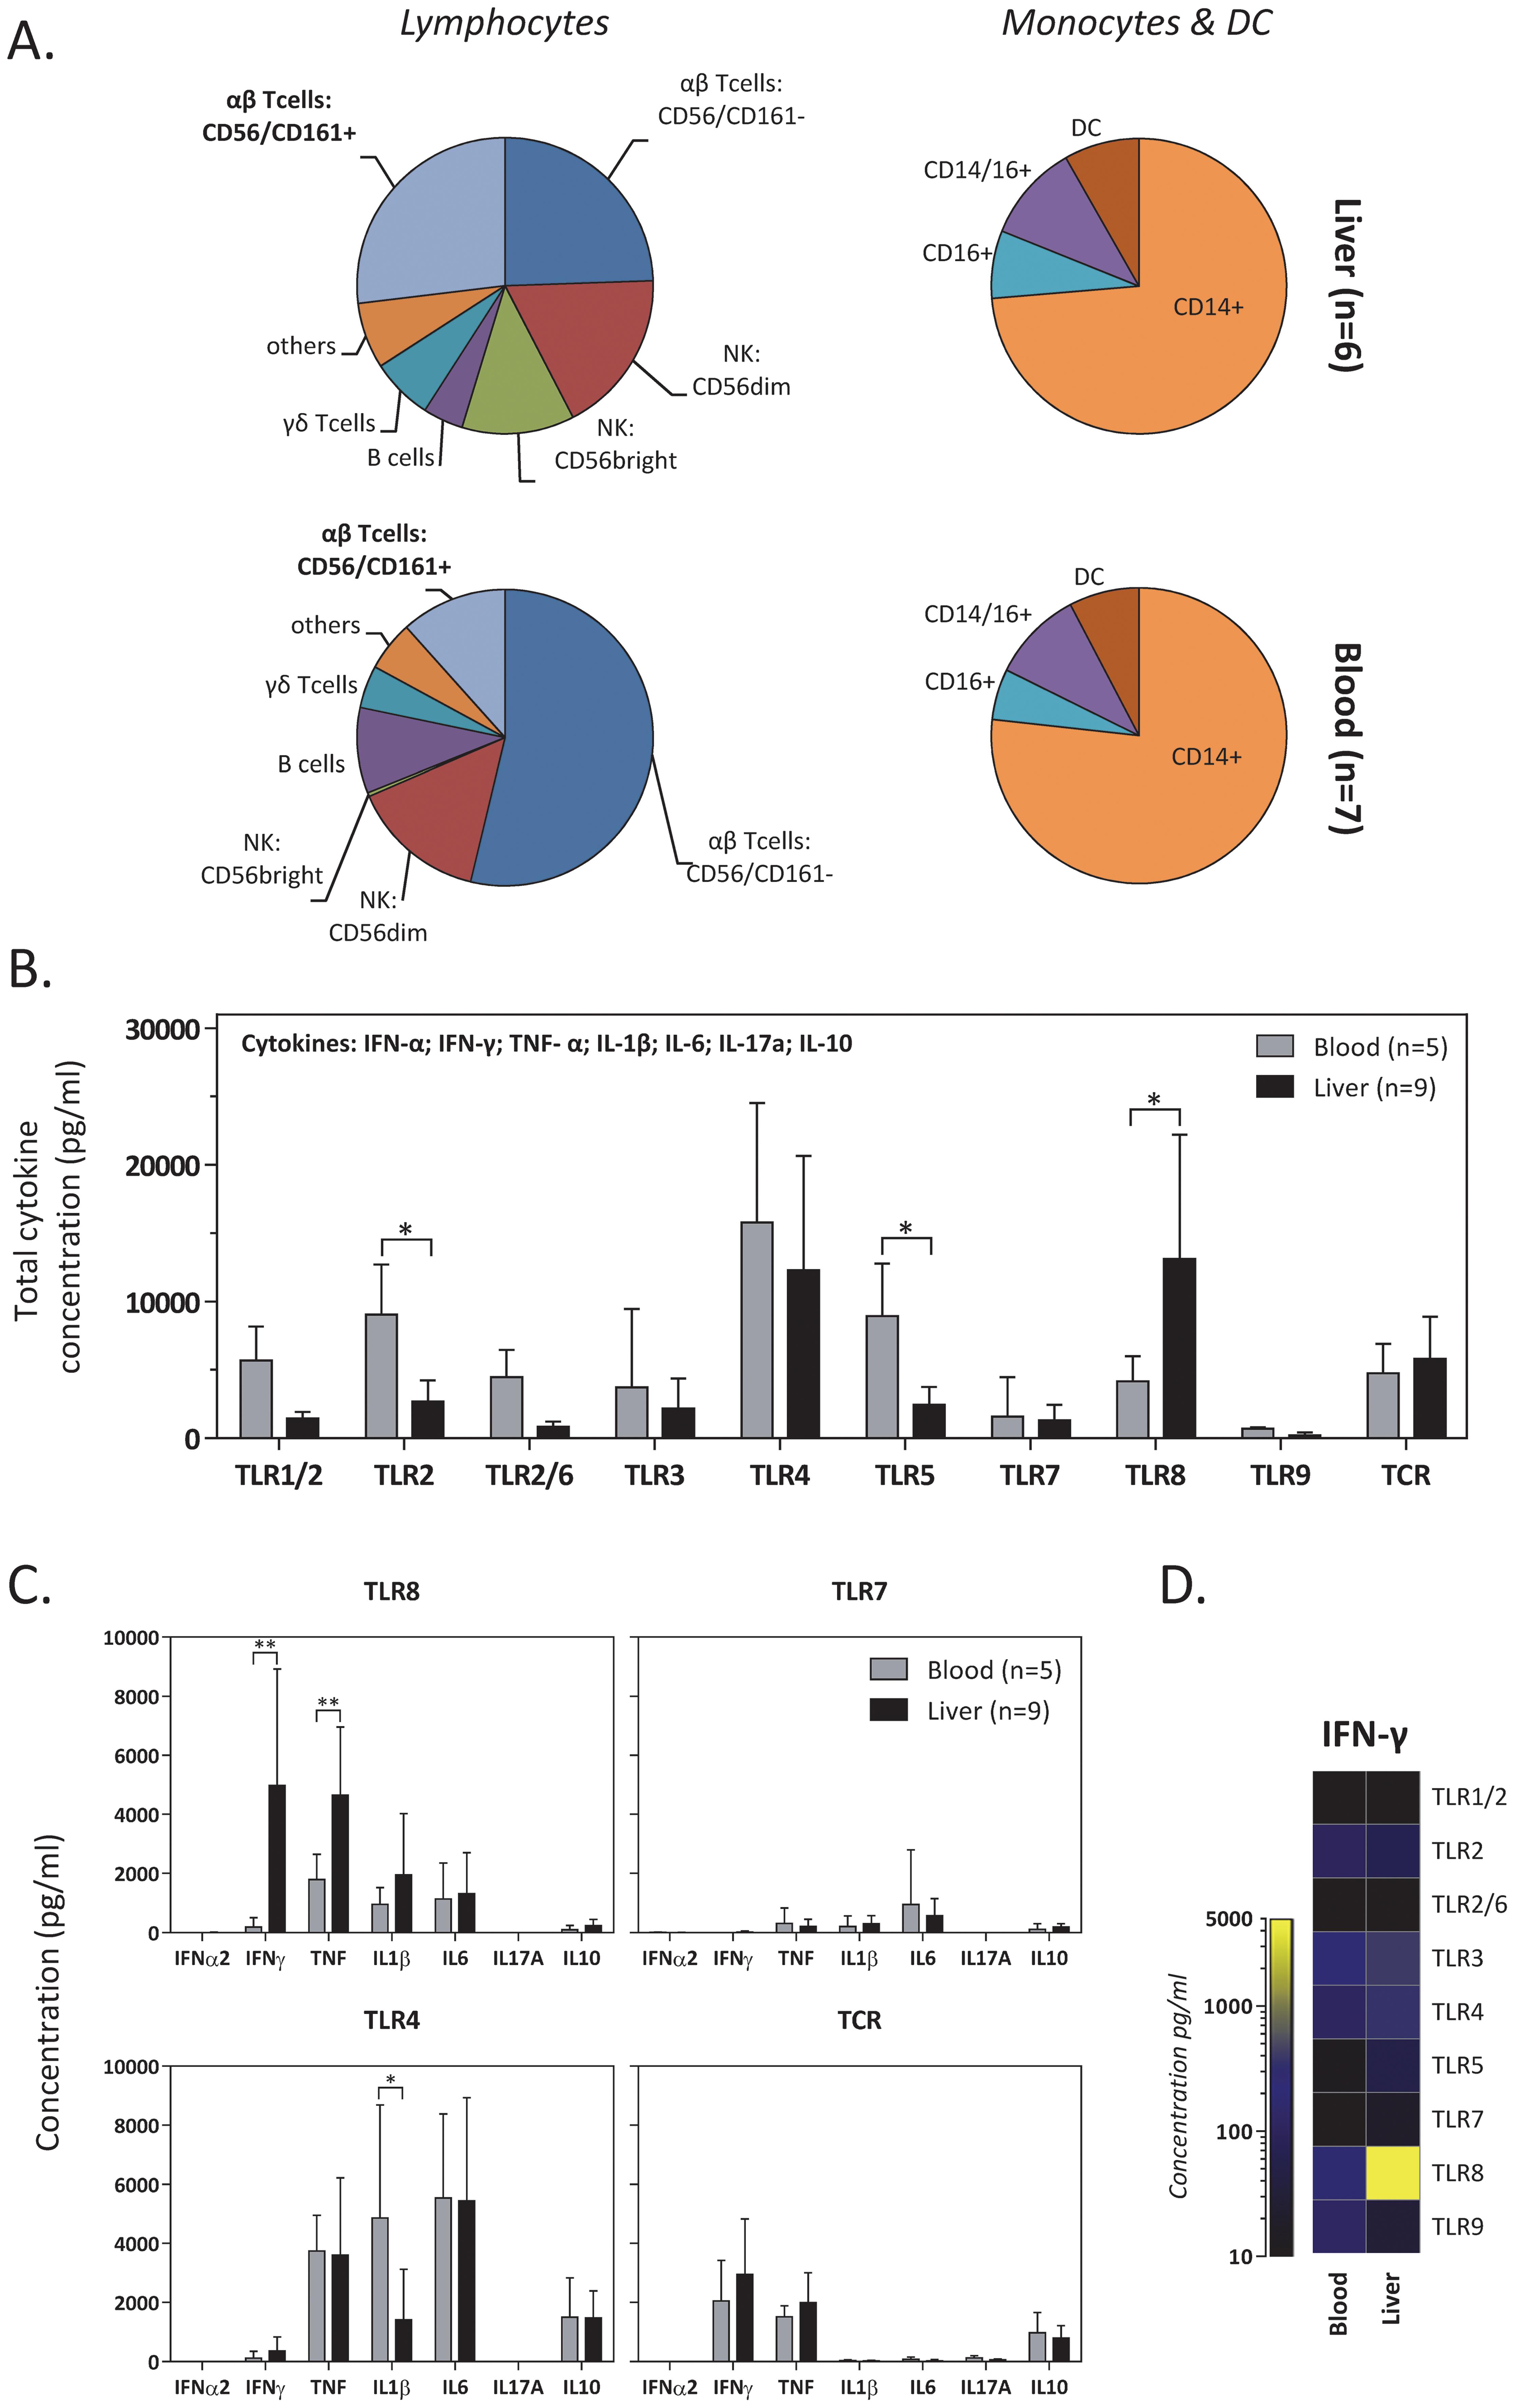 Selective stimulation of liver-derived cells by a TLR8 agonist.